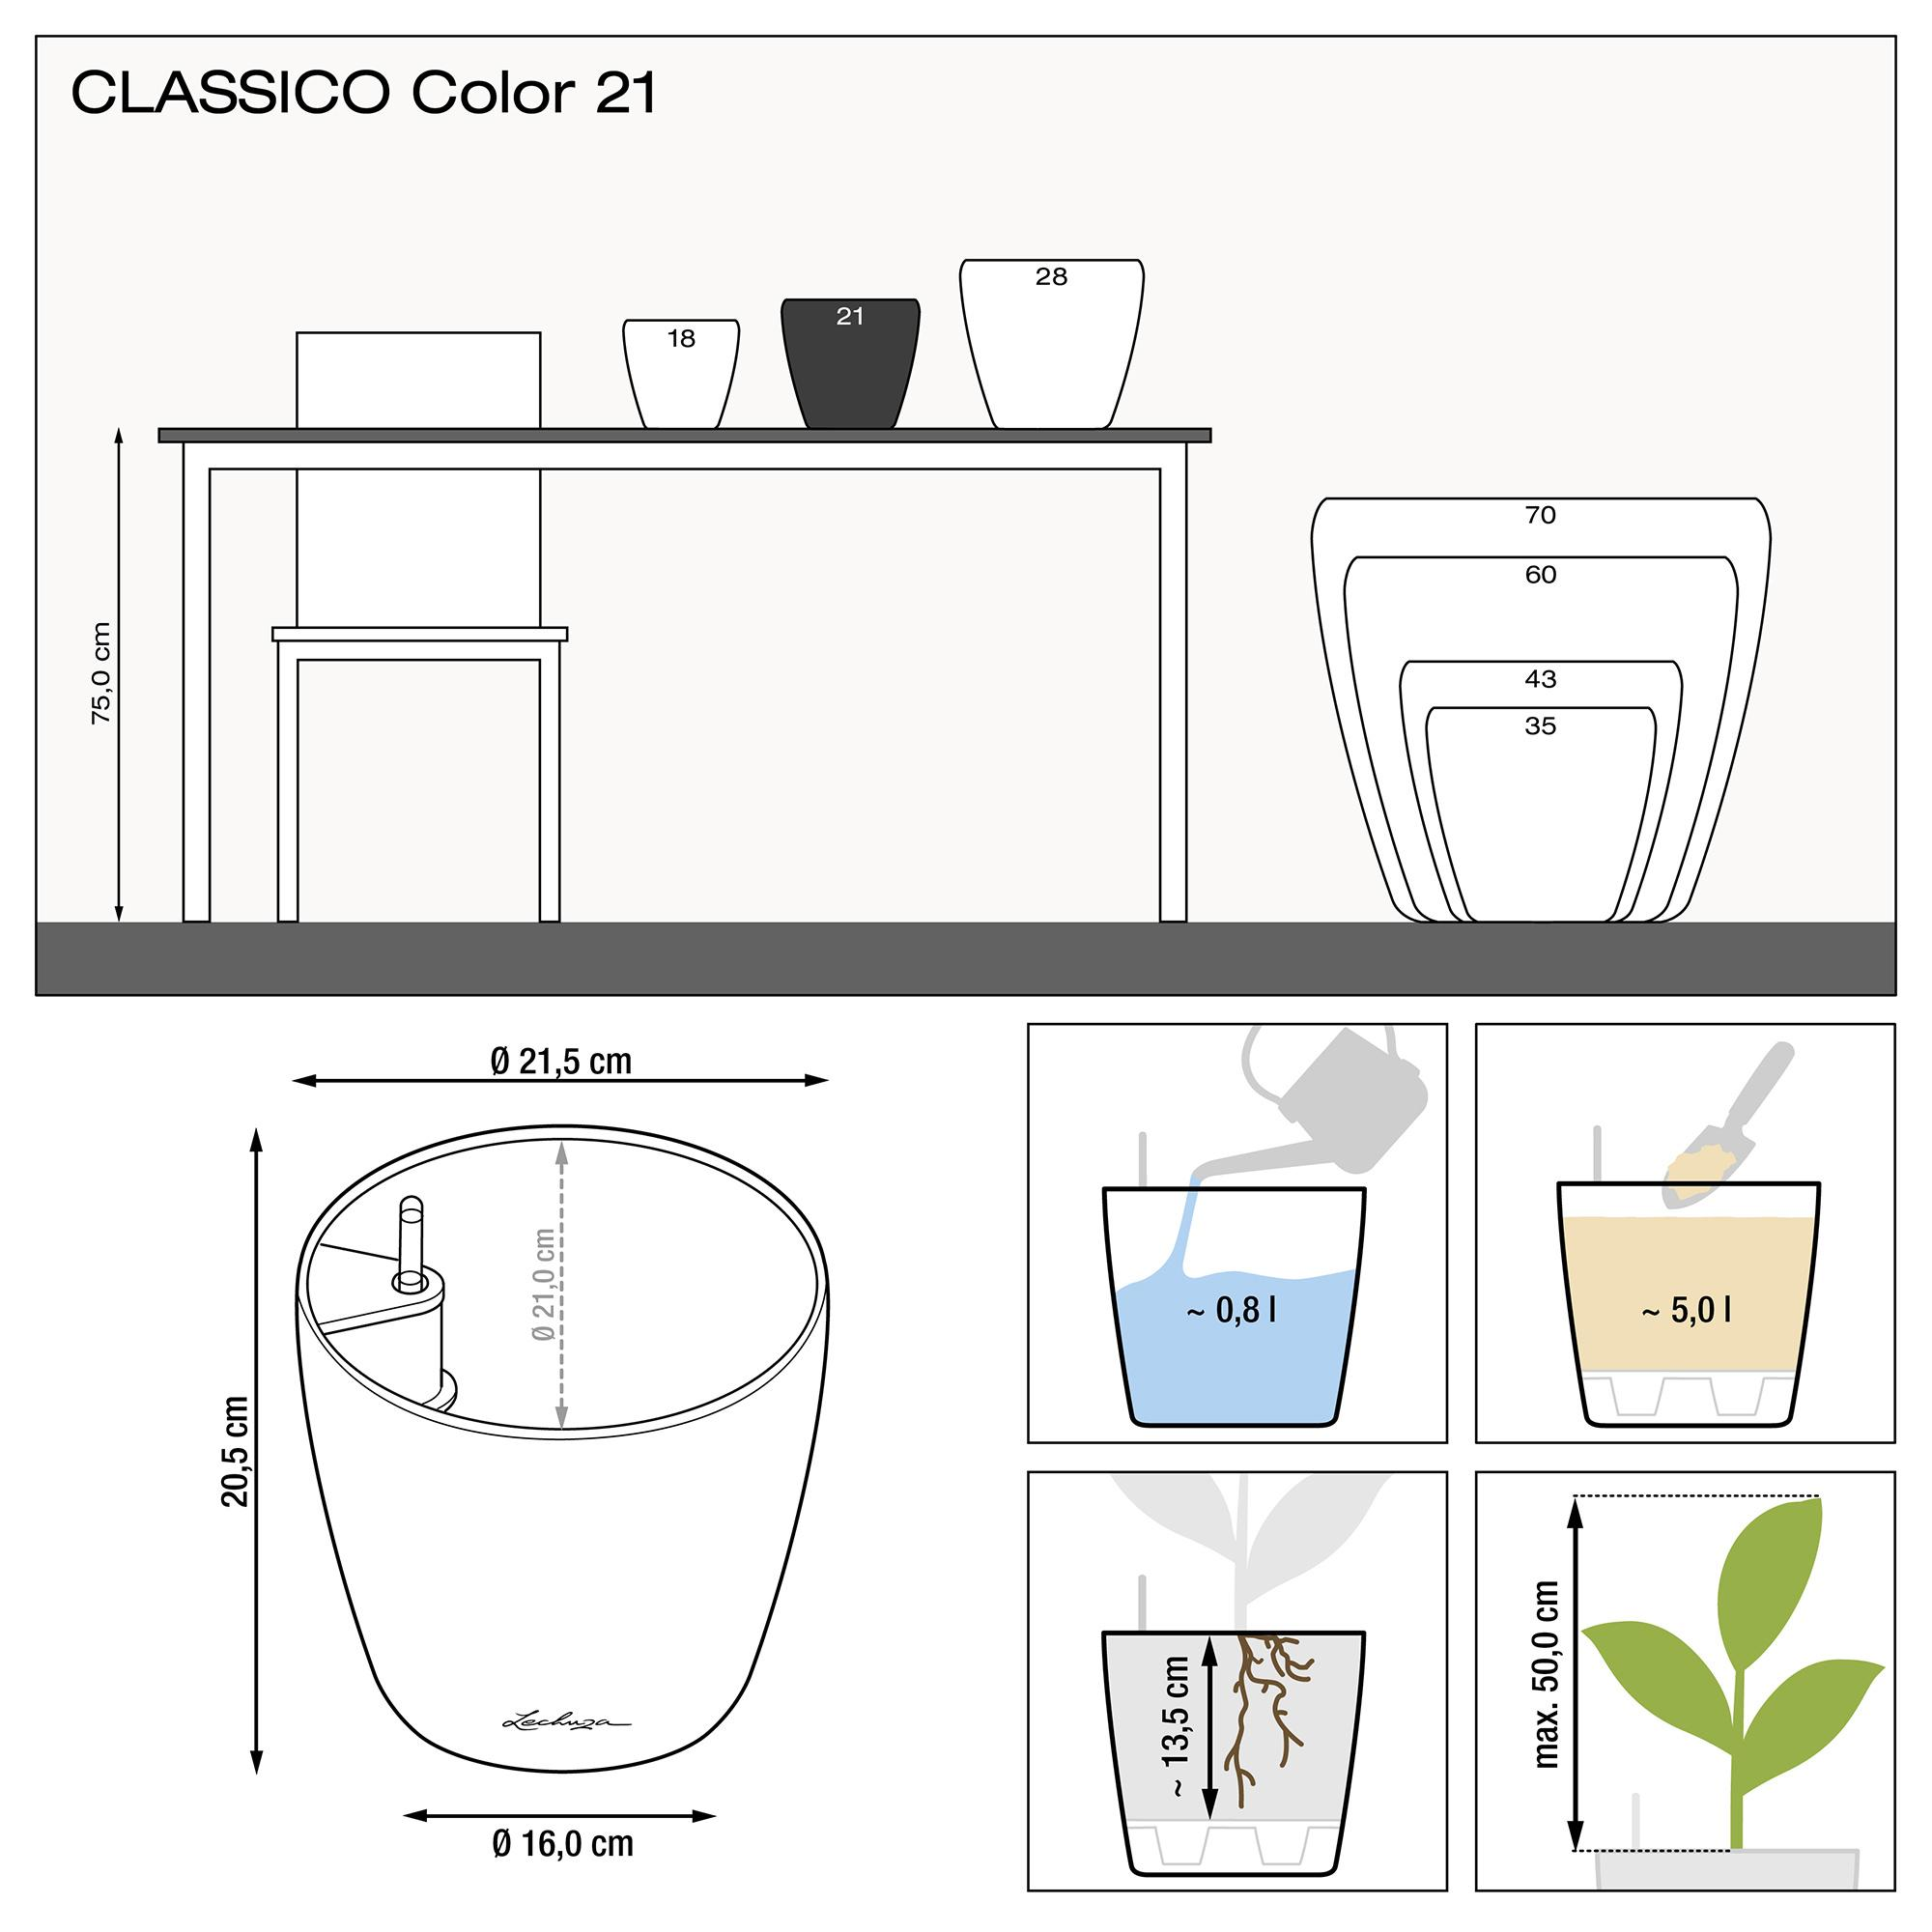 CLASSICO Color 21 muskat - Bild 2